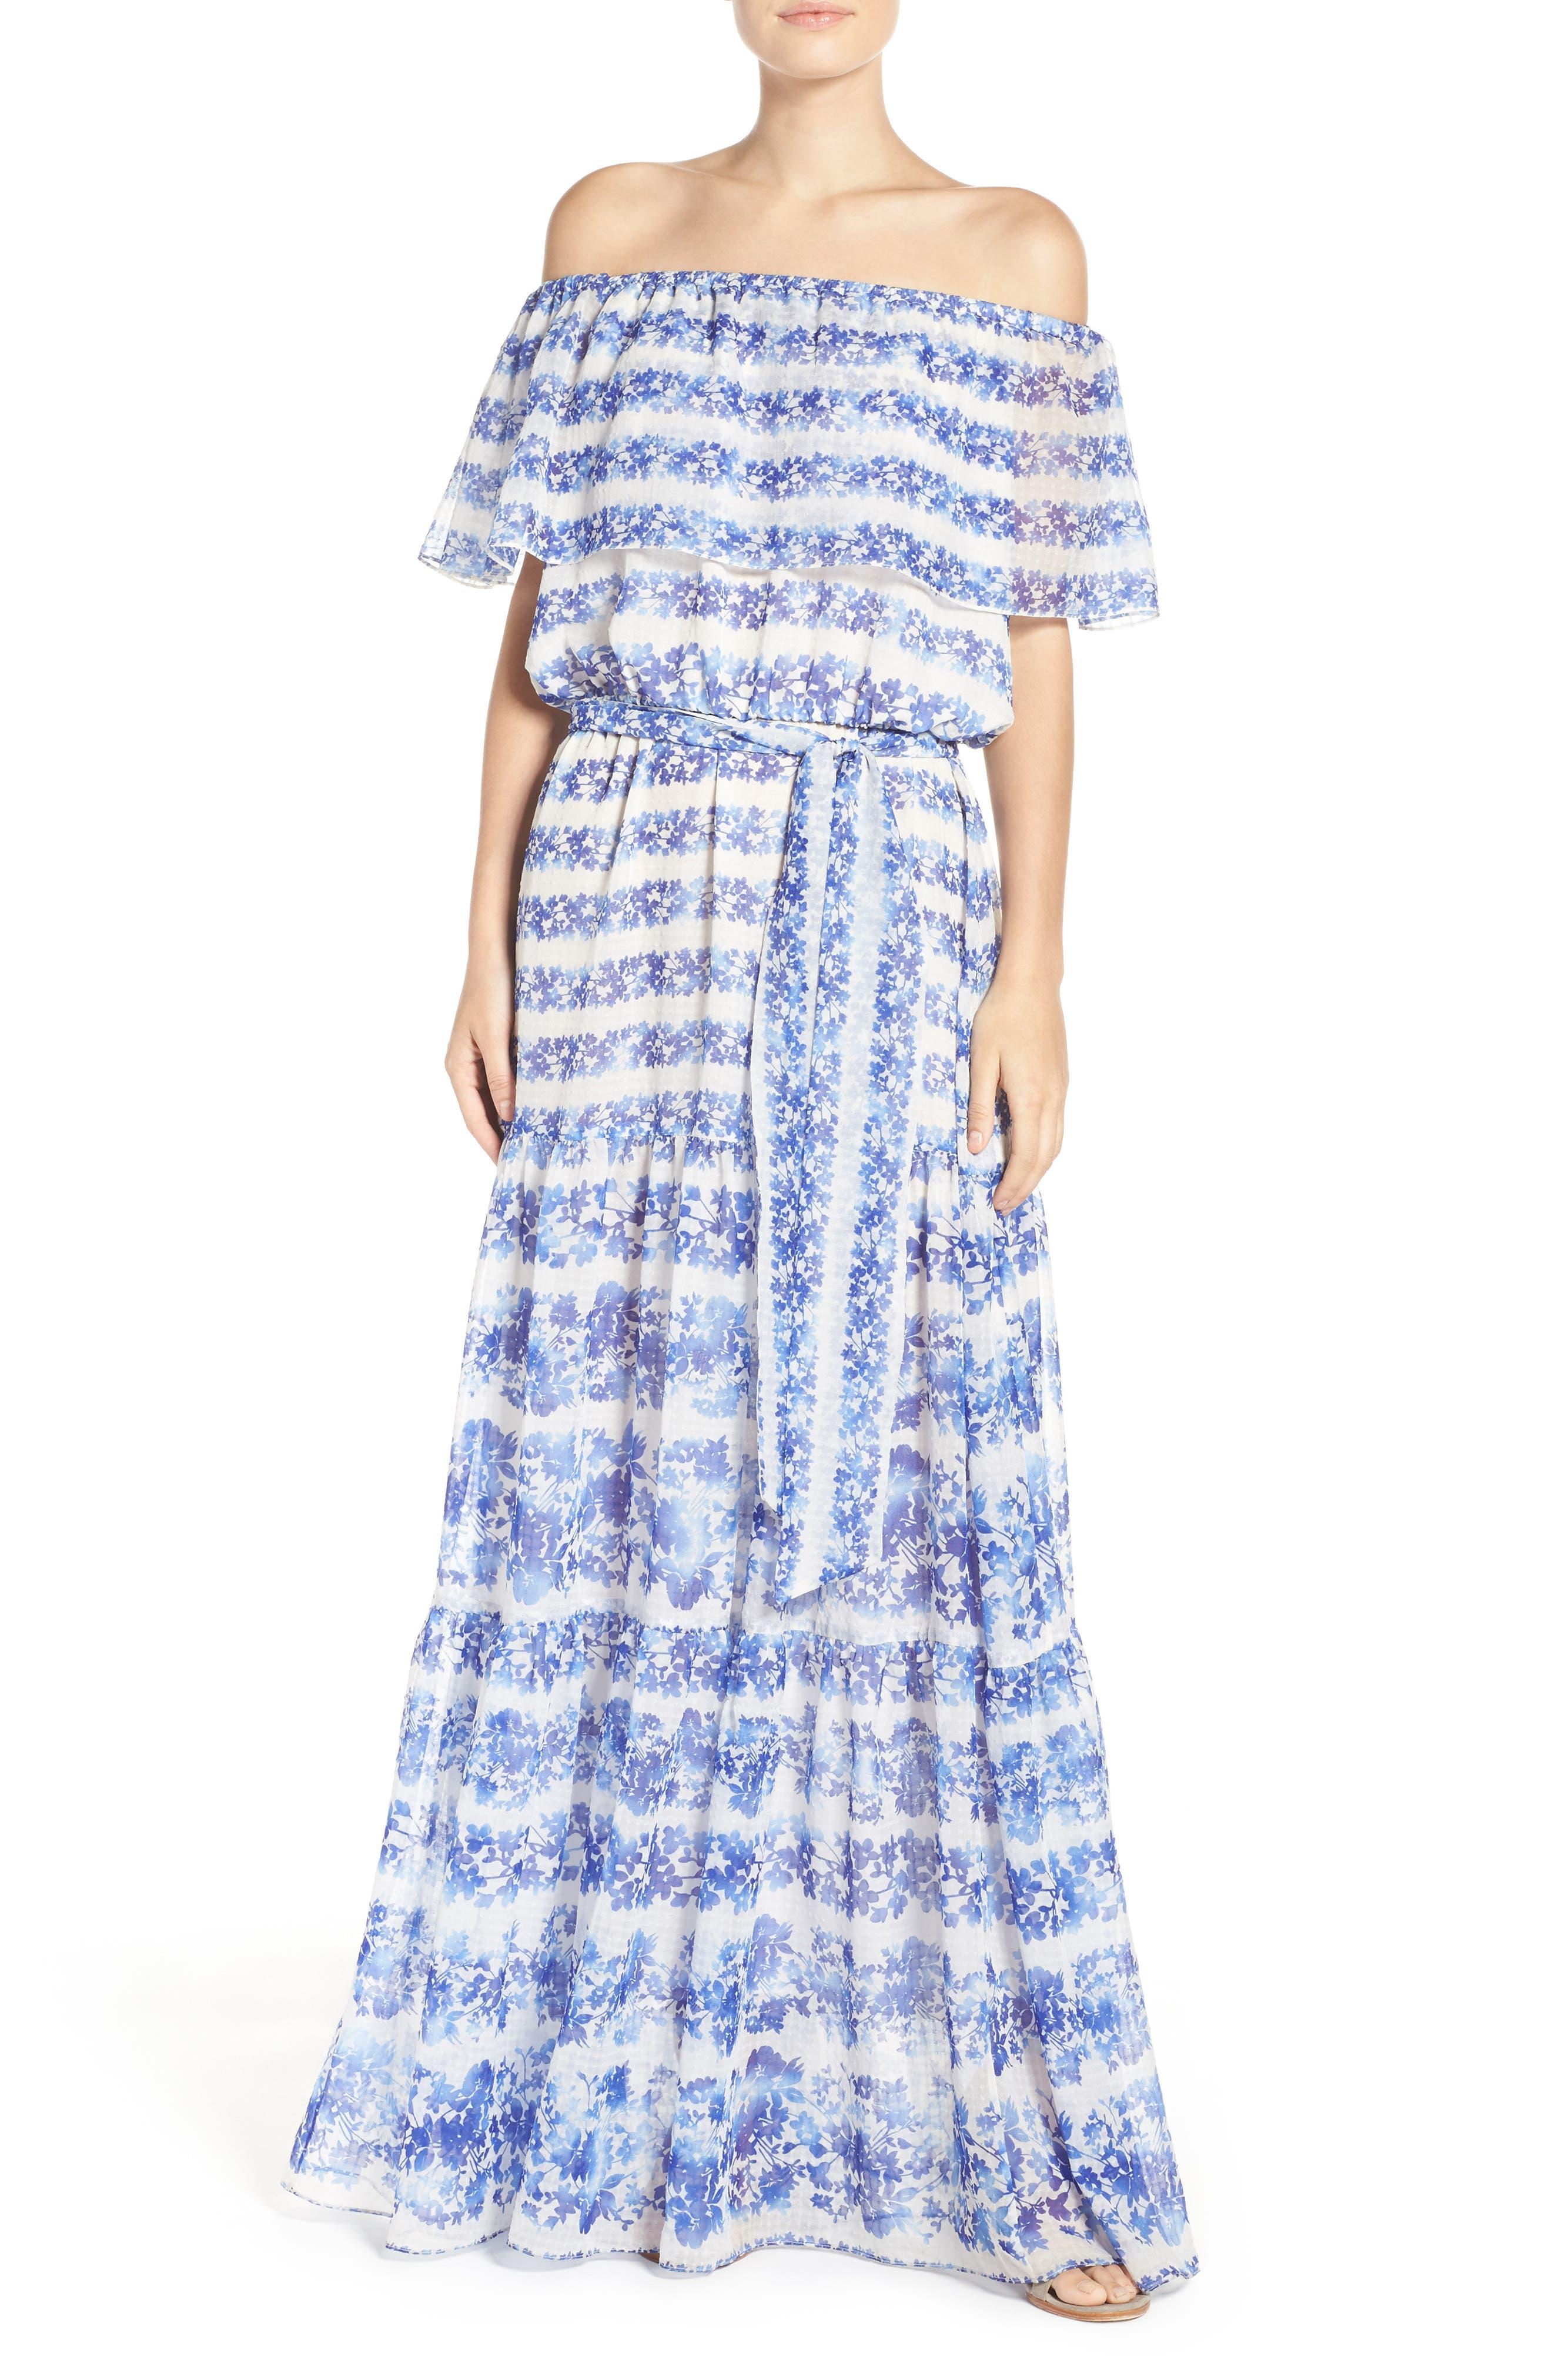 ELIZA J Blouson Maxi Dress, Main, color, 442